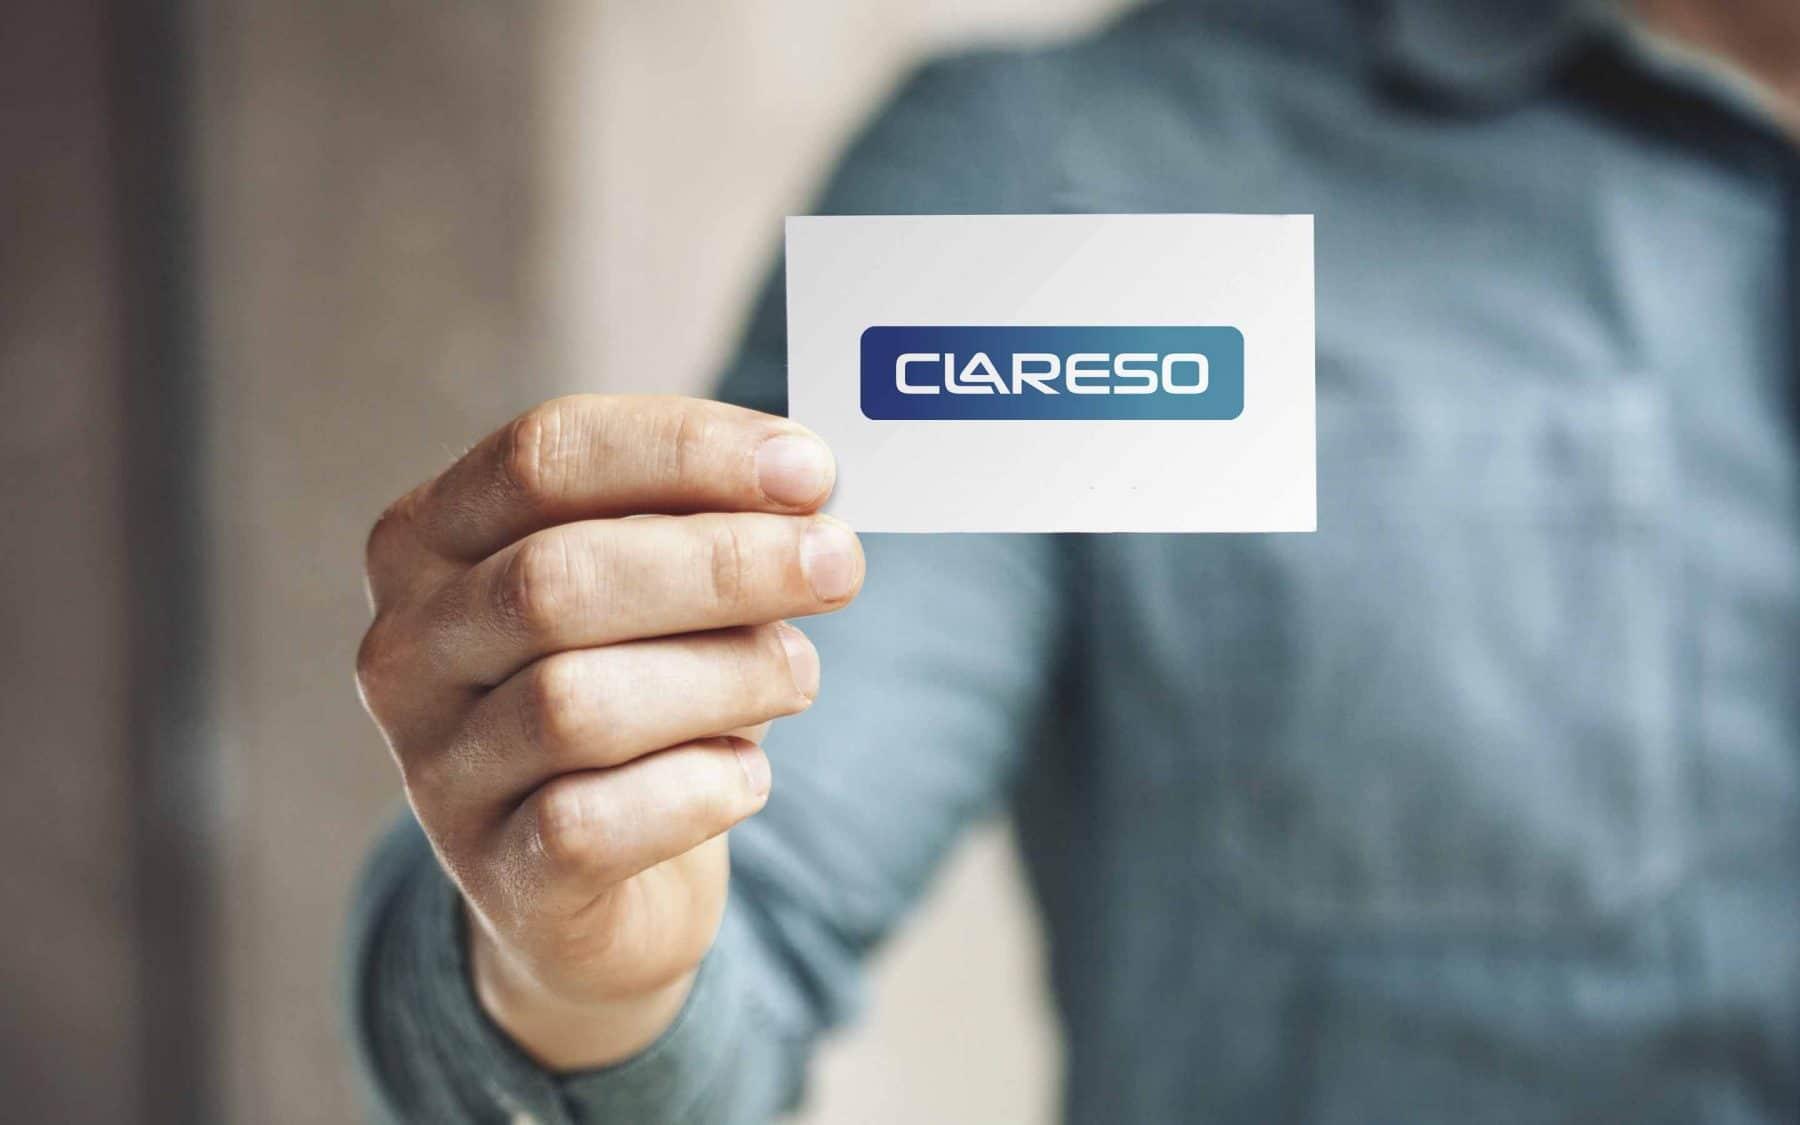 Clareso 1